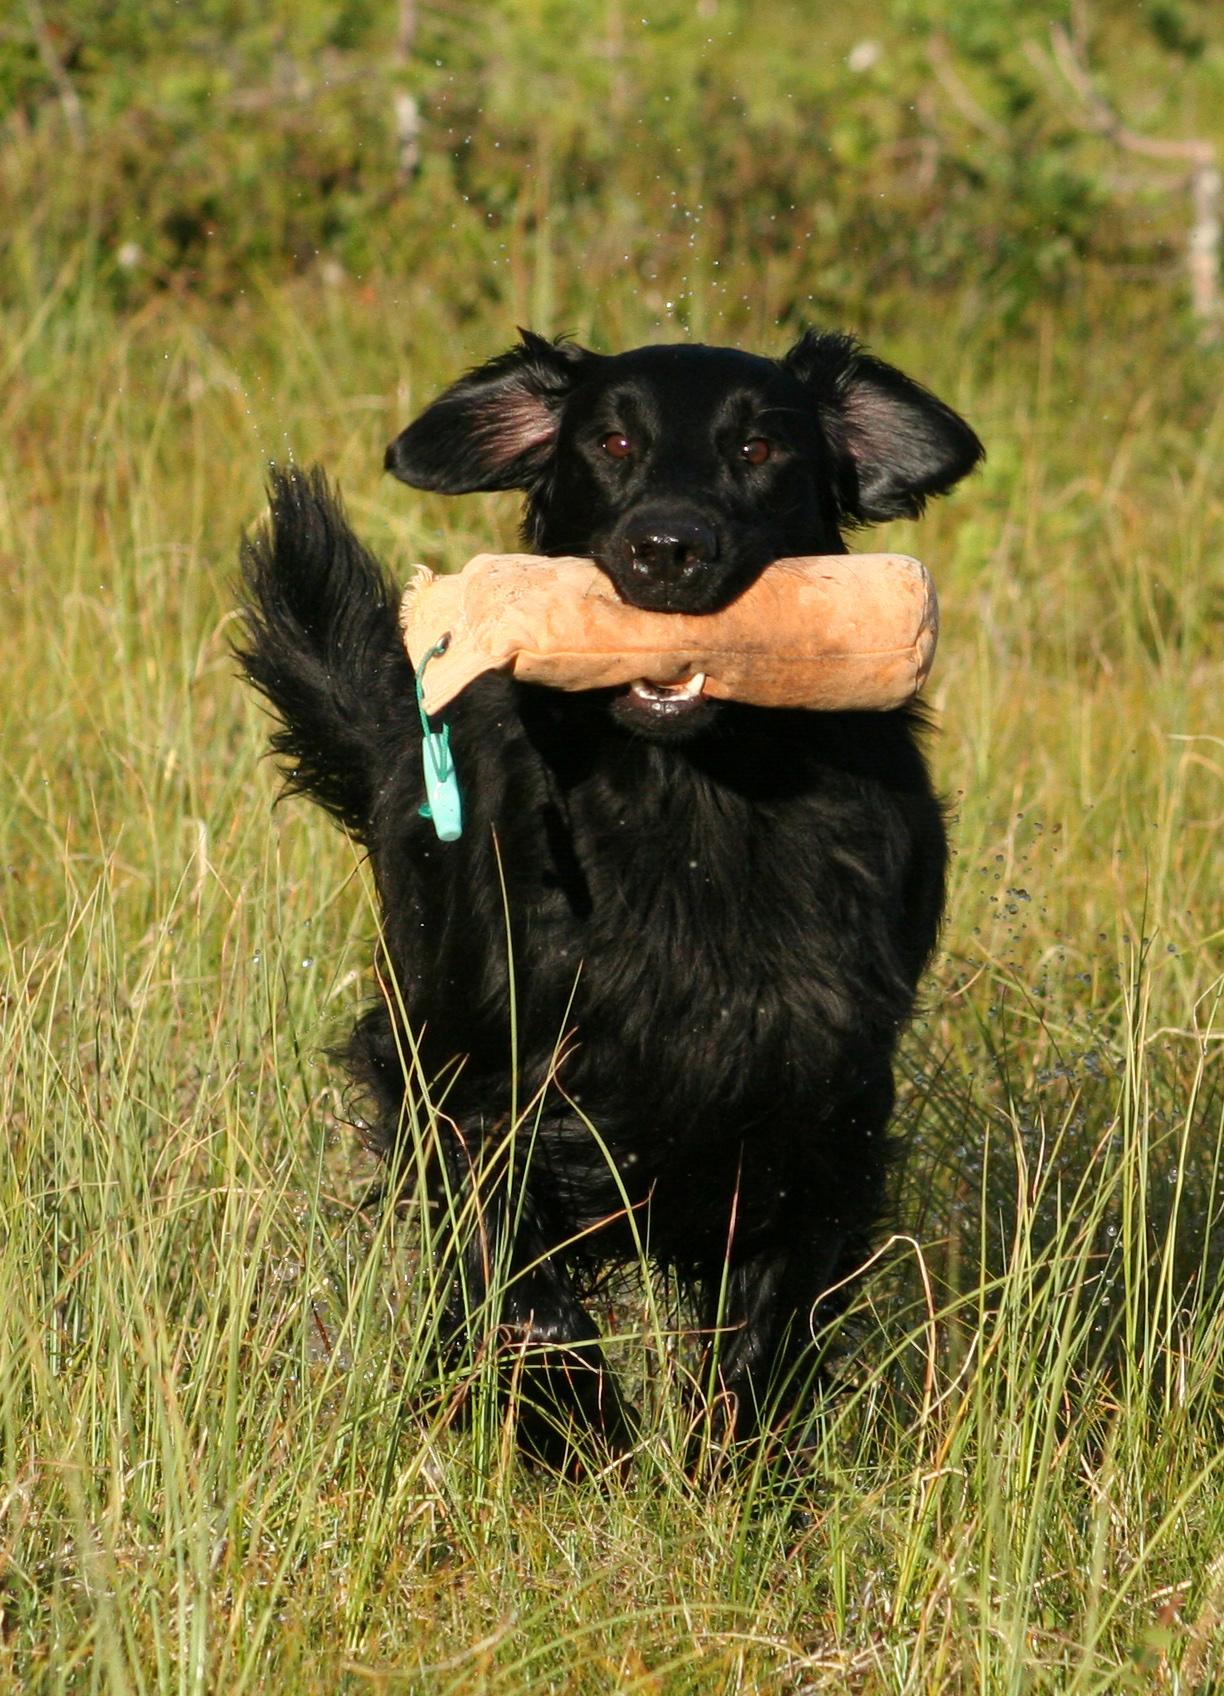 Flat Coated Retriever - Pedigreed Breeds - DogWellNet.com